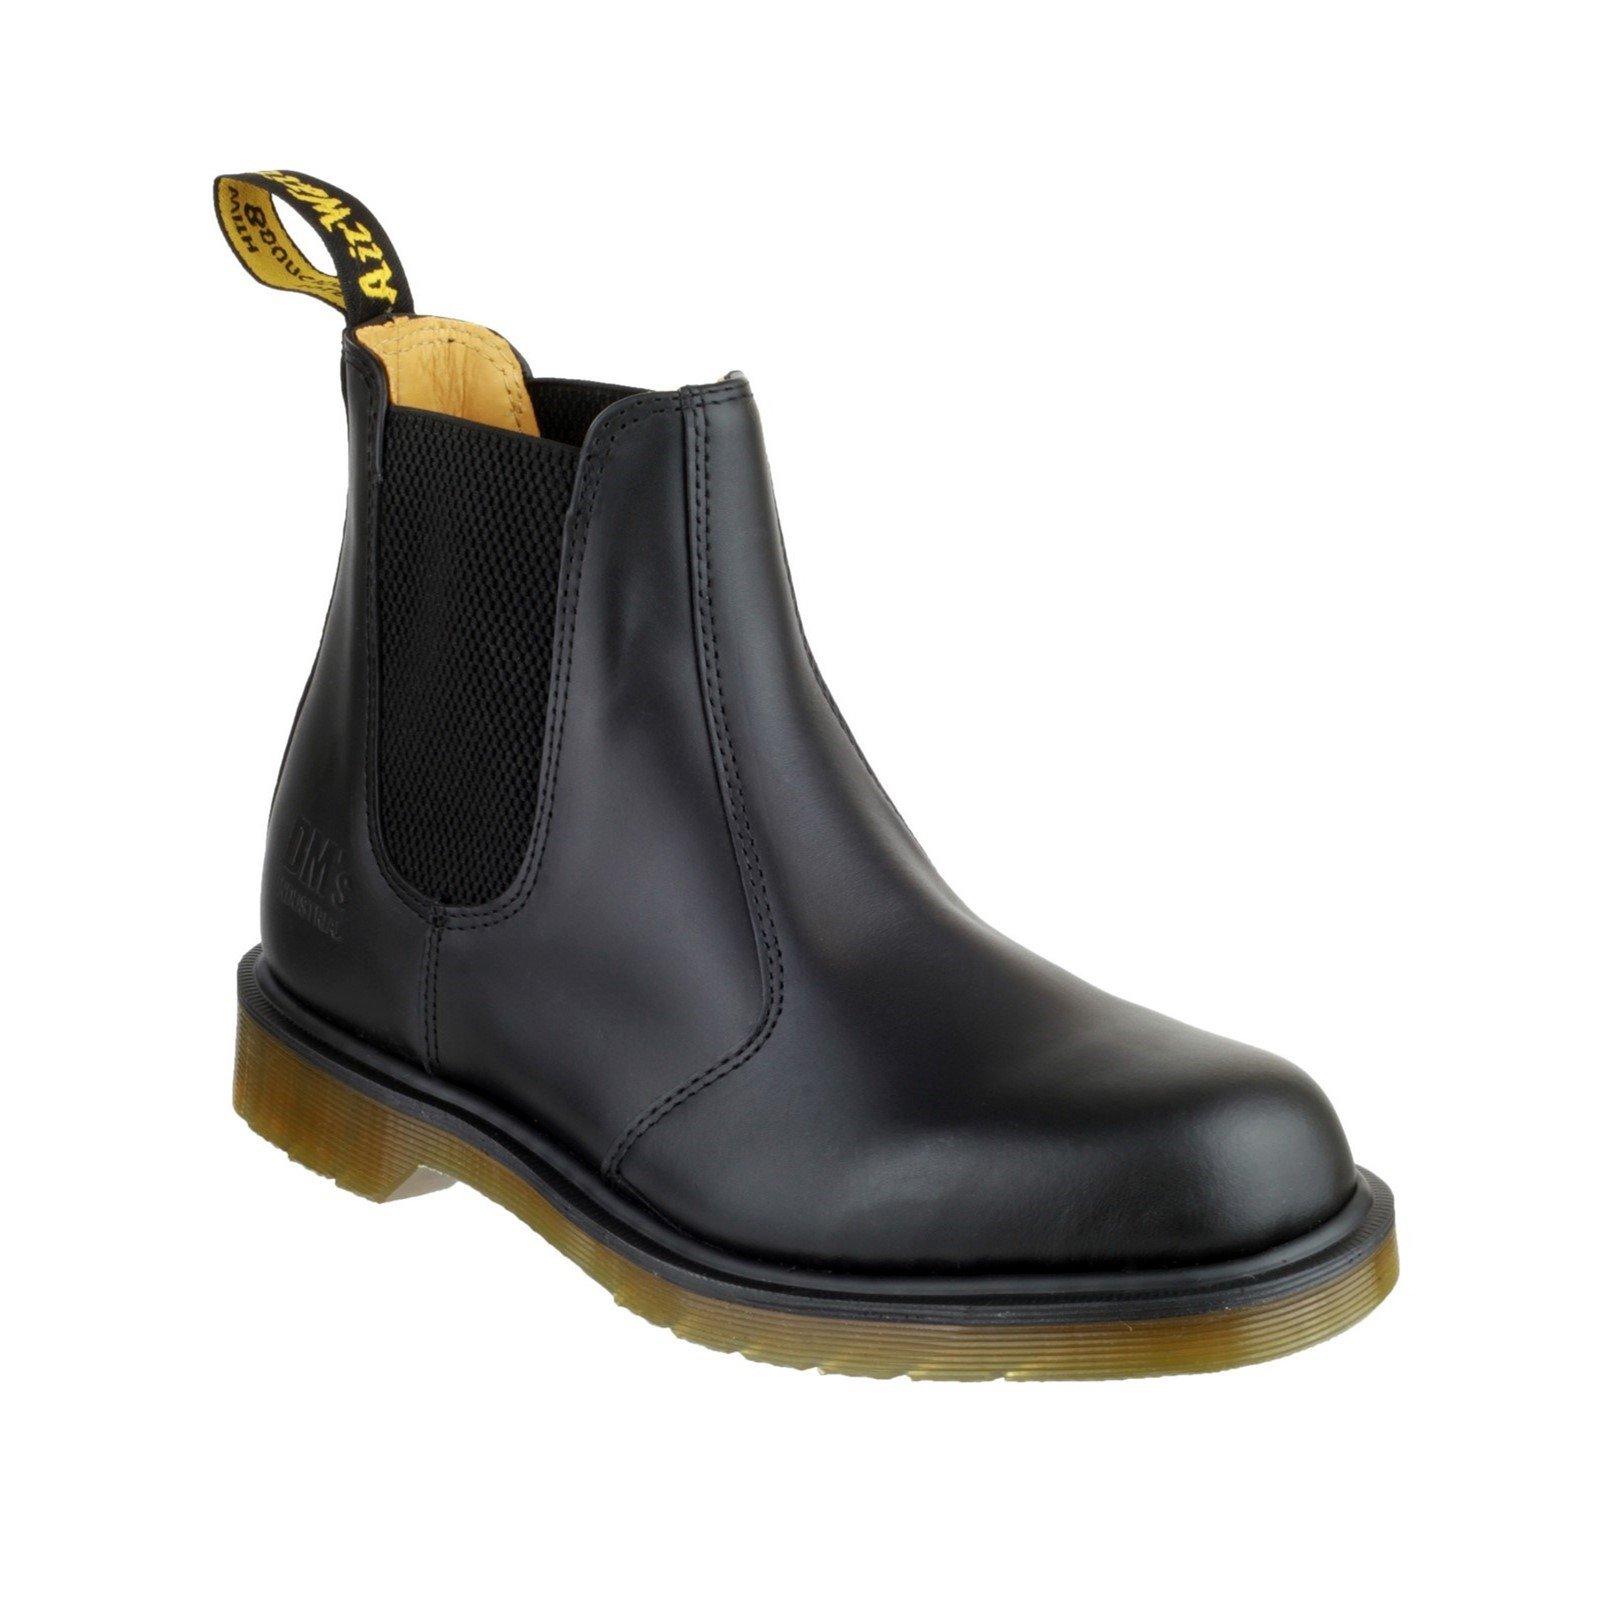 Dr Martens Men's Slip-On Dealer Boot Black 04916 - Black 11